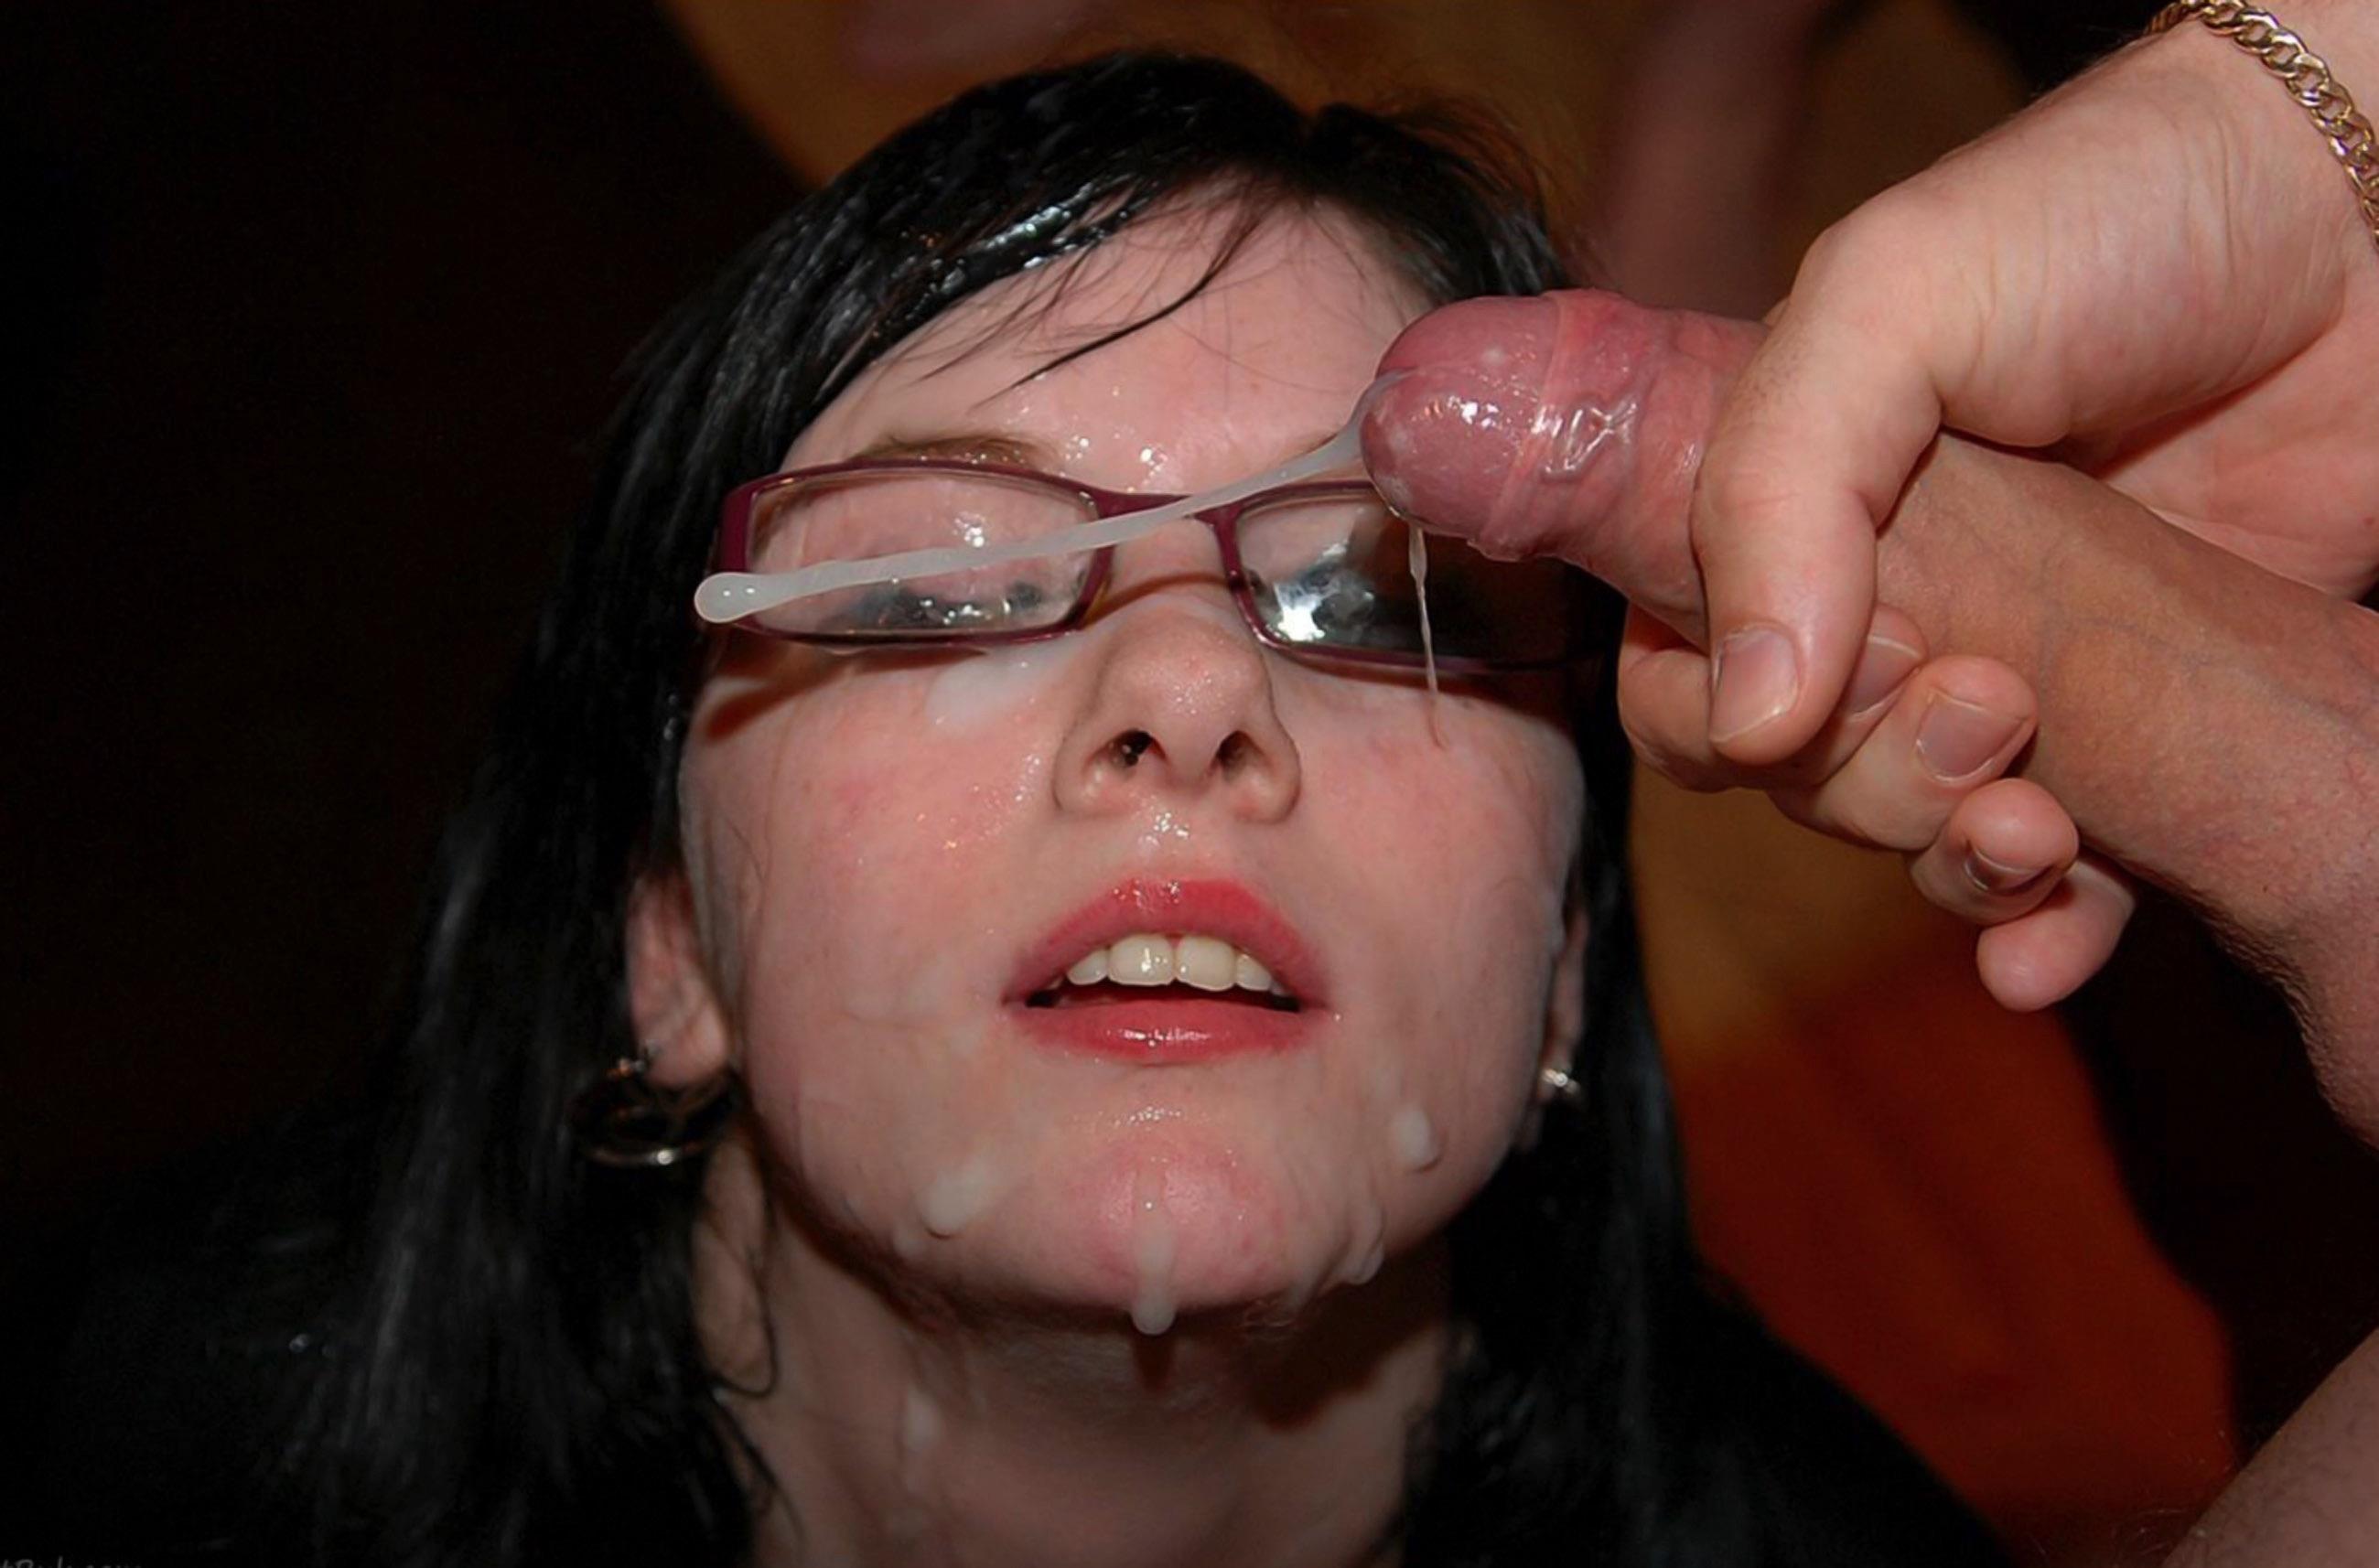 3 Girls Vs 1 Porn Handjob Cumshort handjob close up cum shots - other - xxx photos